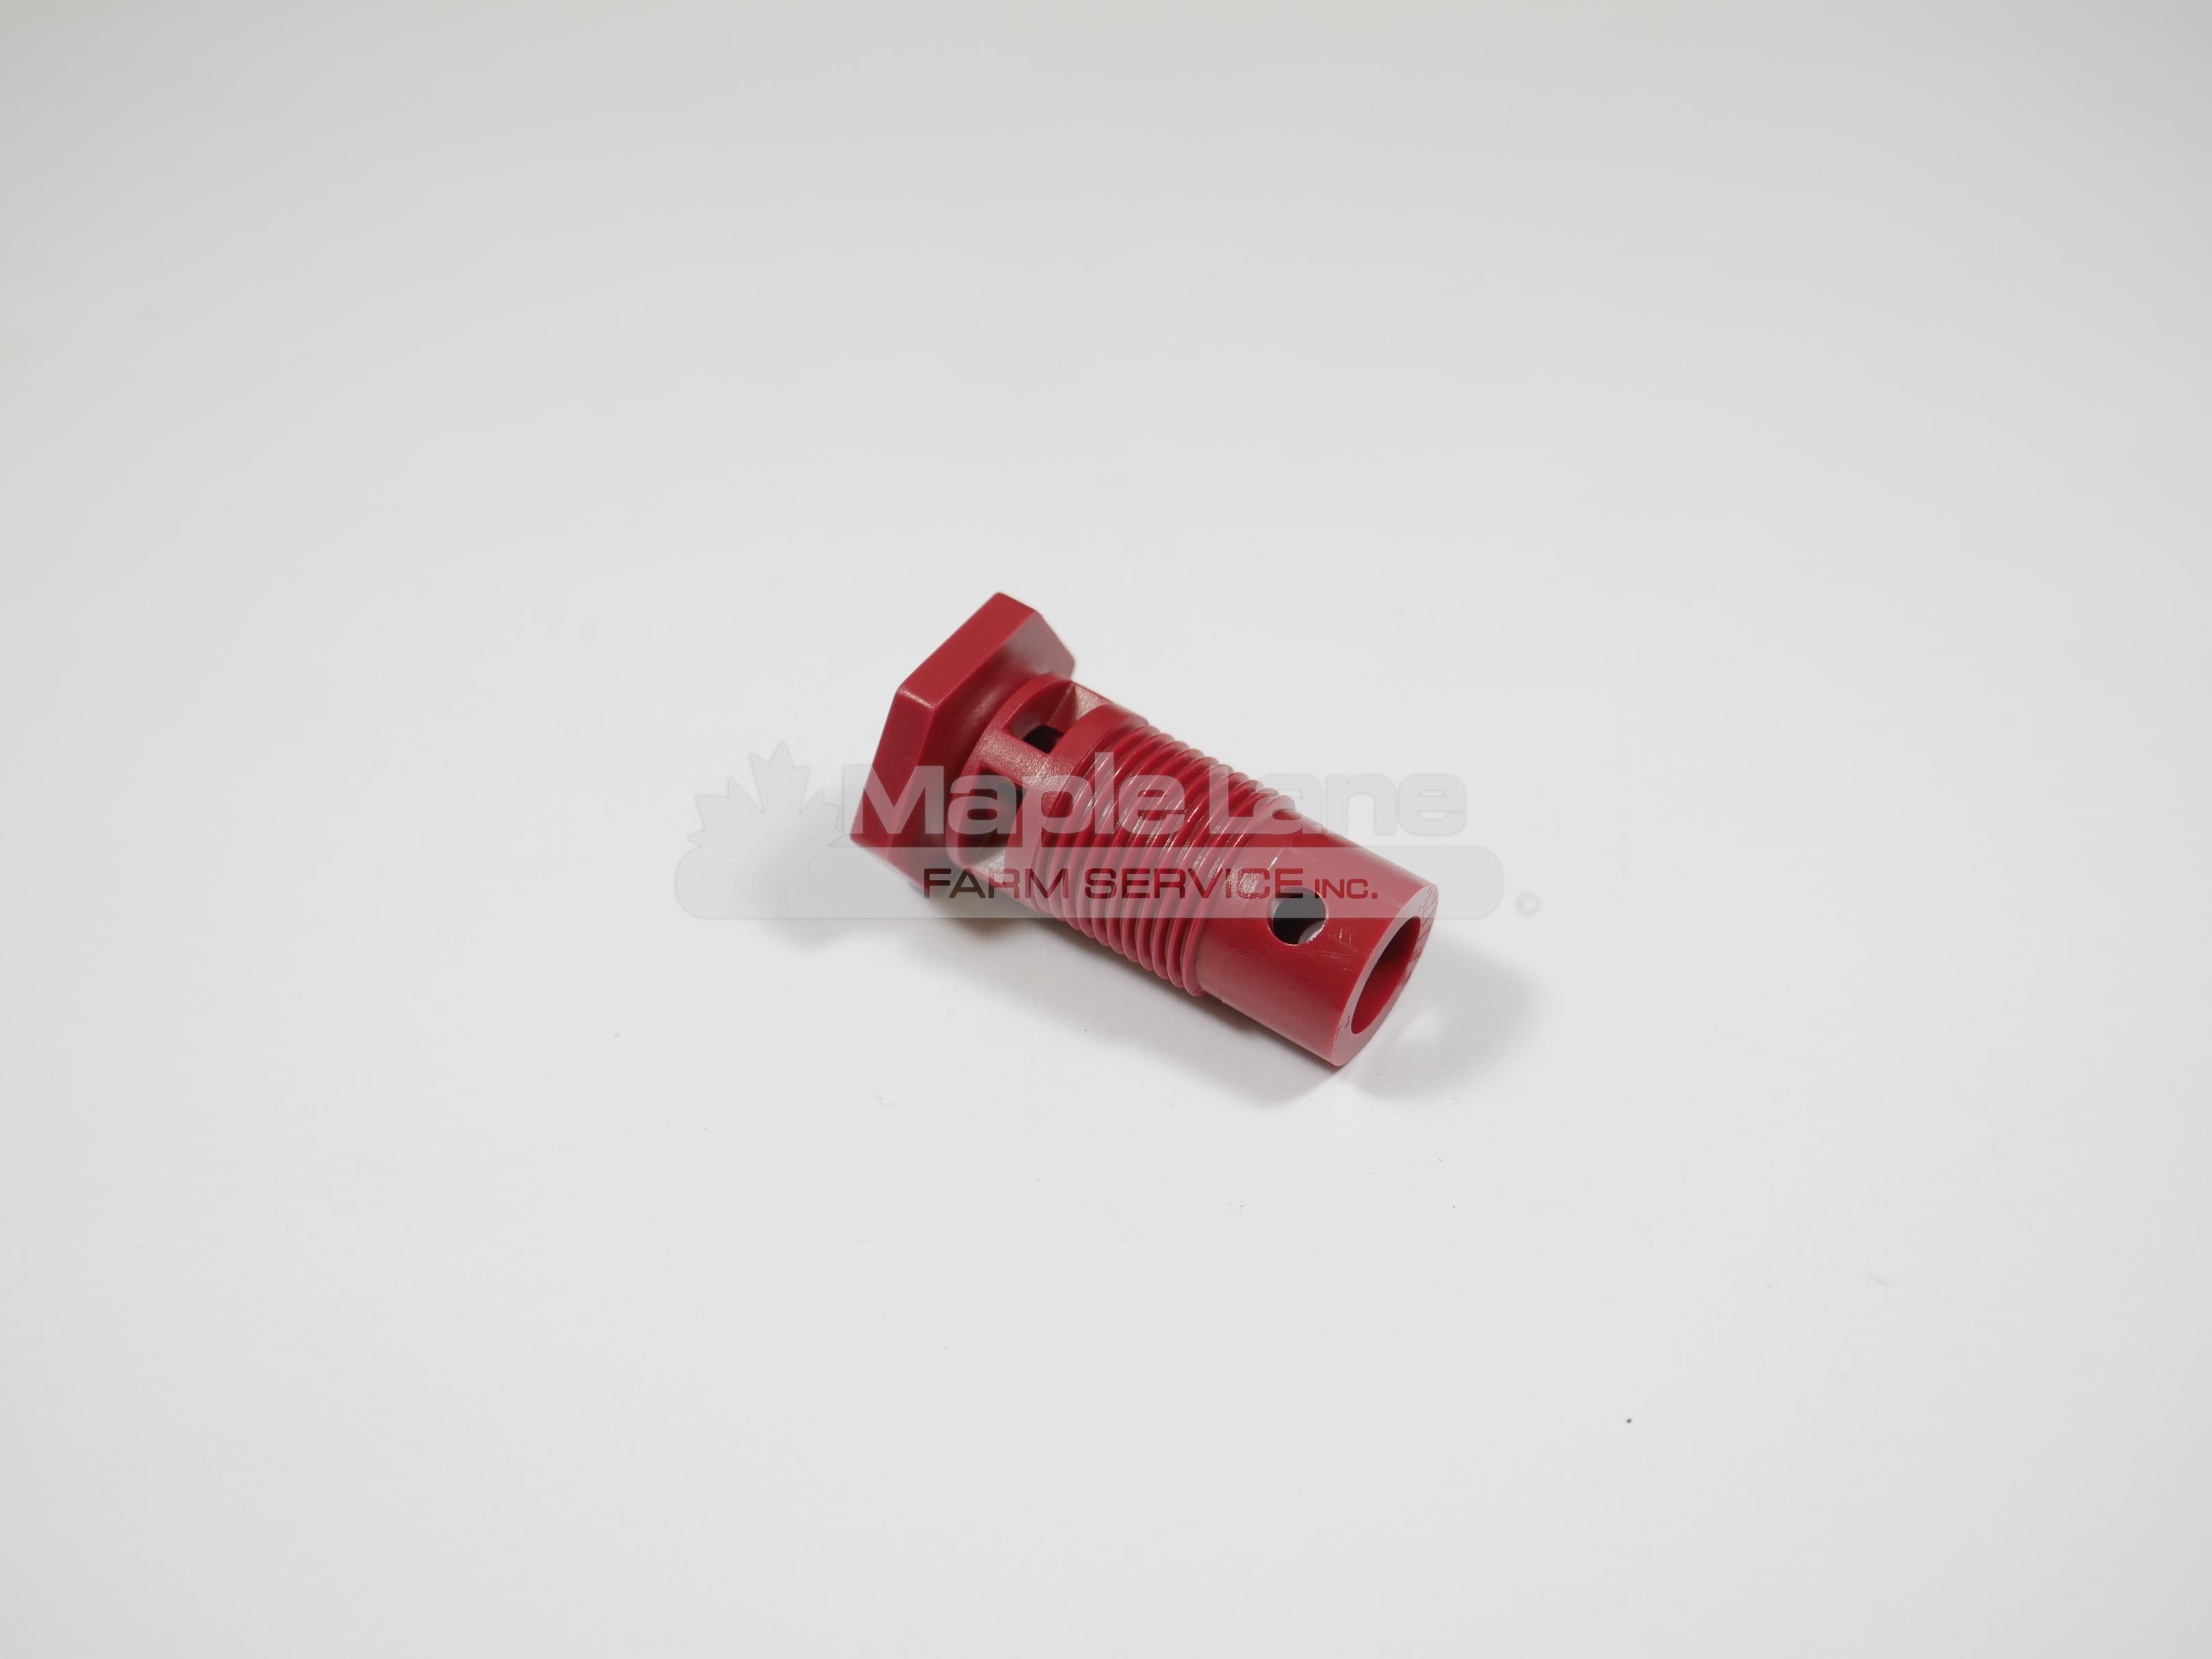 321182 Drain Plug Filter 3/8 BSP